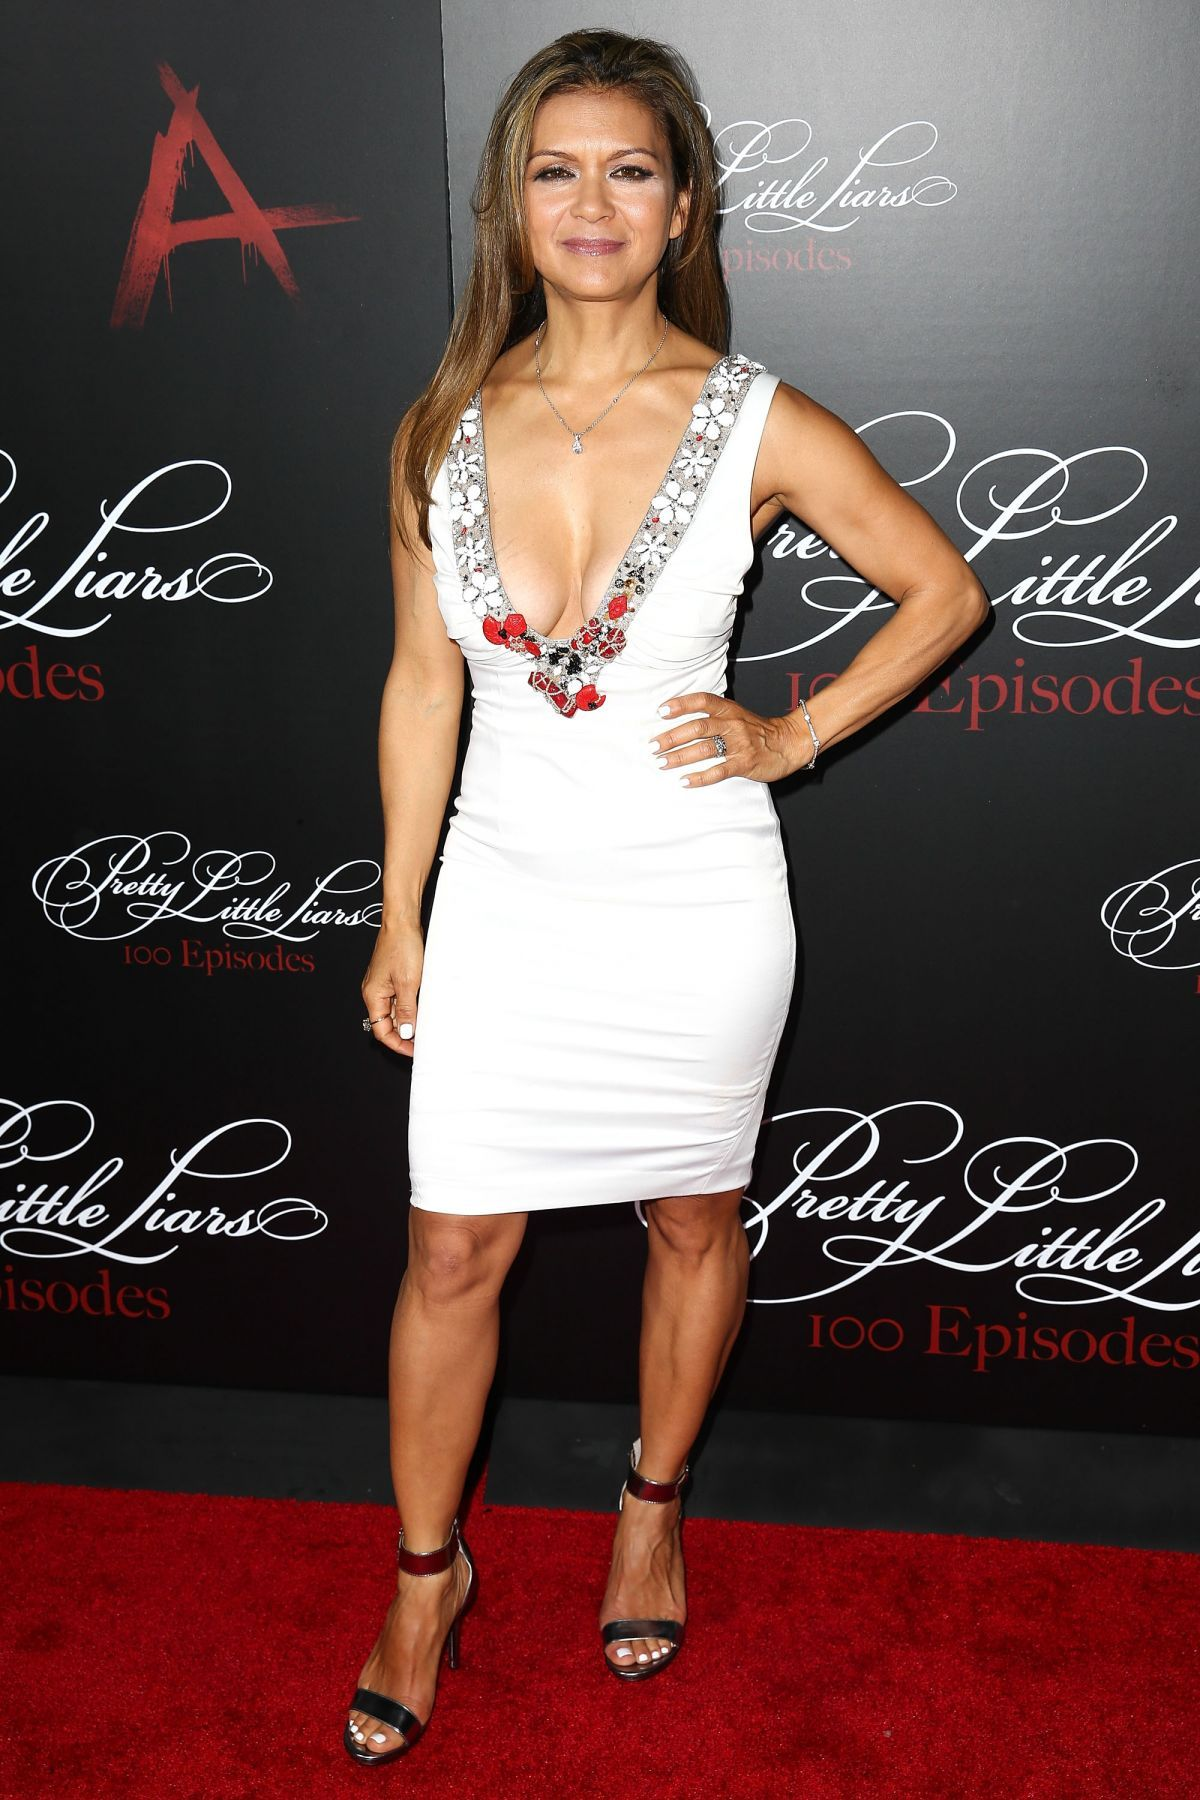 Nia Peeples, TV Actress | Leaked Celebs | Pinterest | Nia peeples, Famous women and Actresses